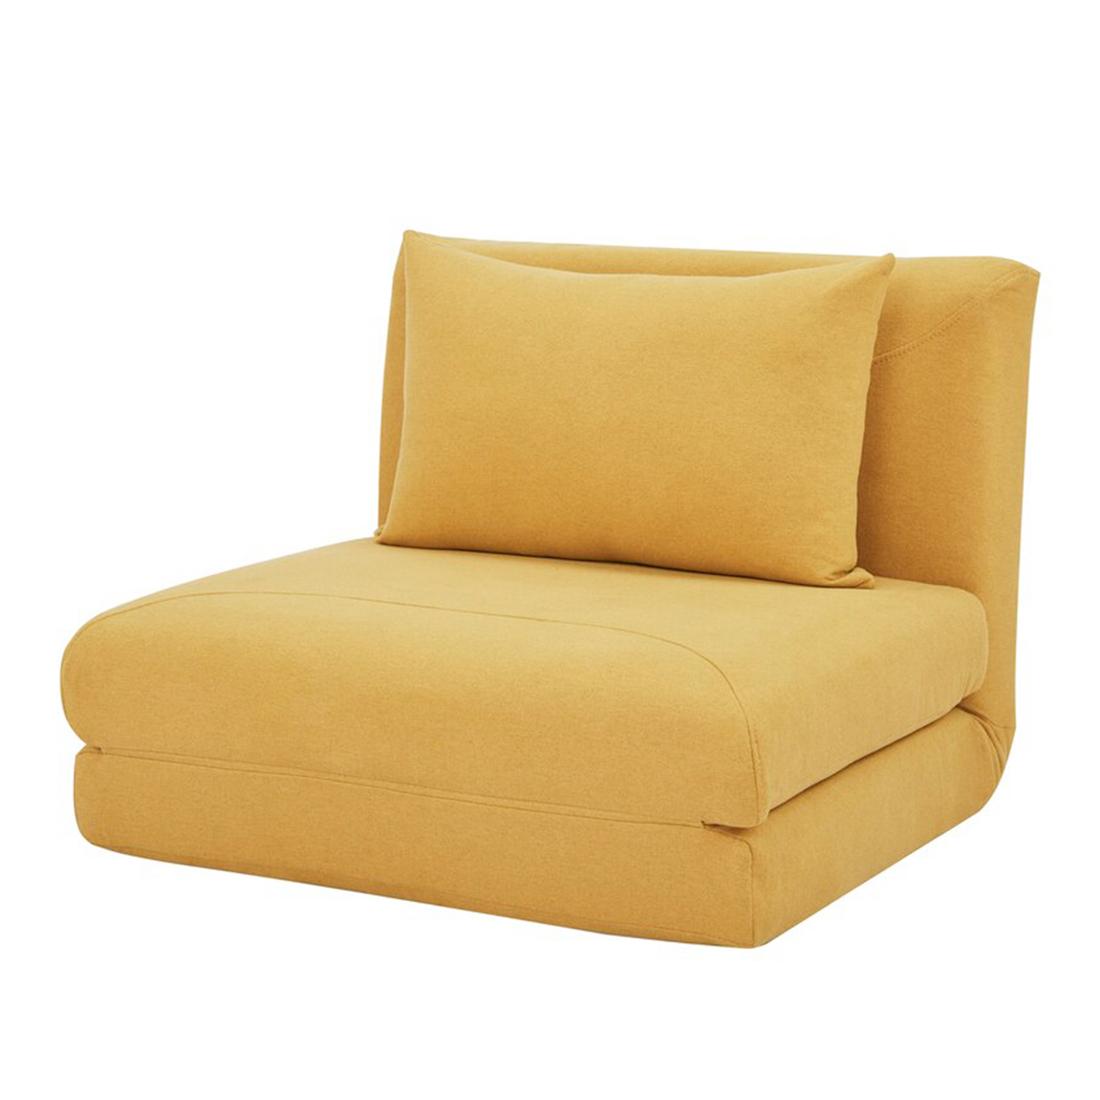 Кресла без ножек фото